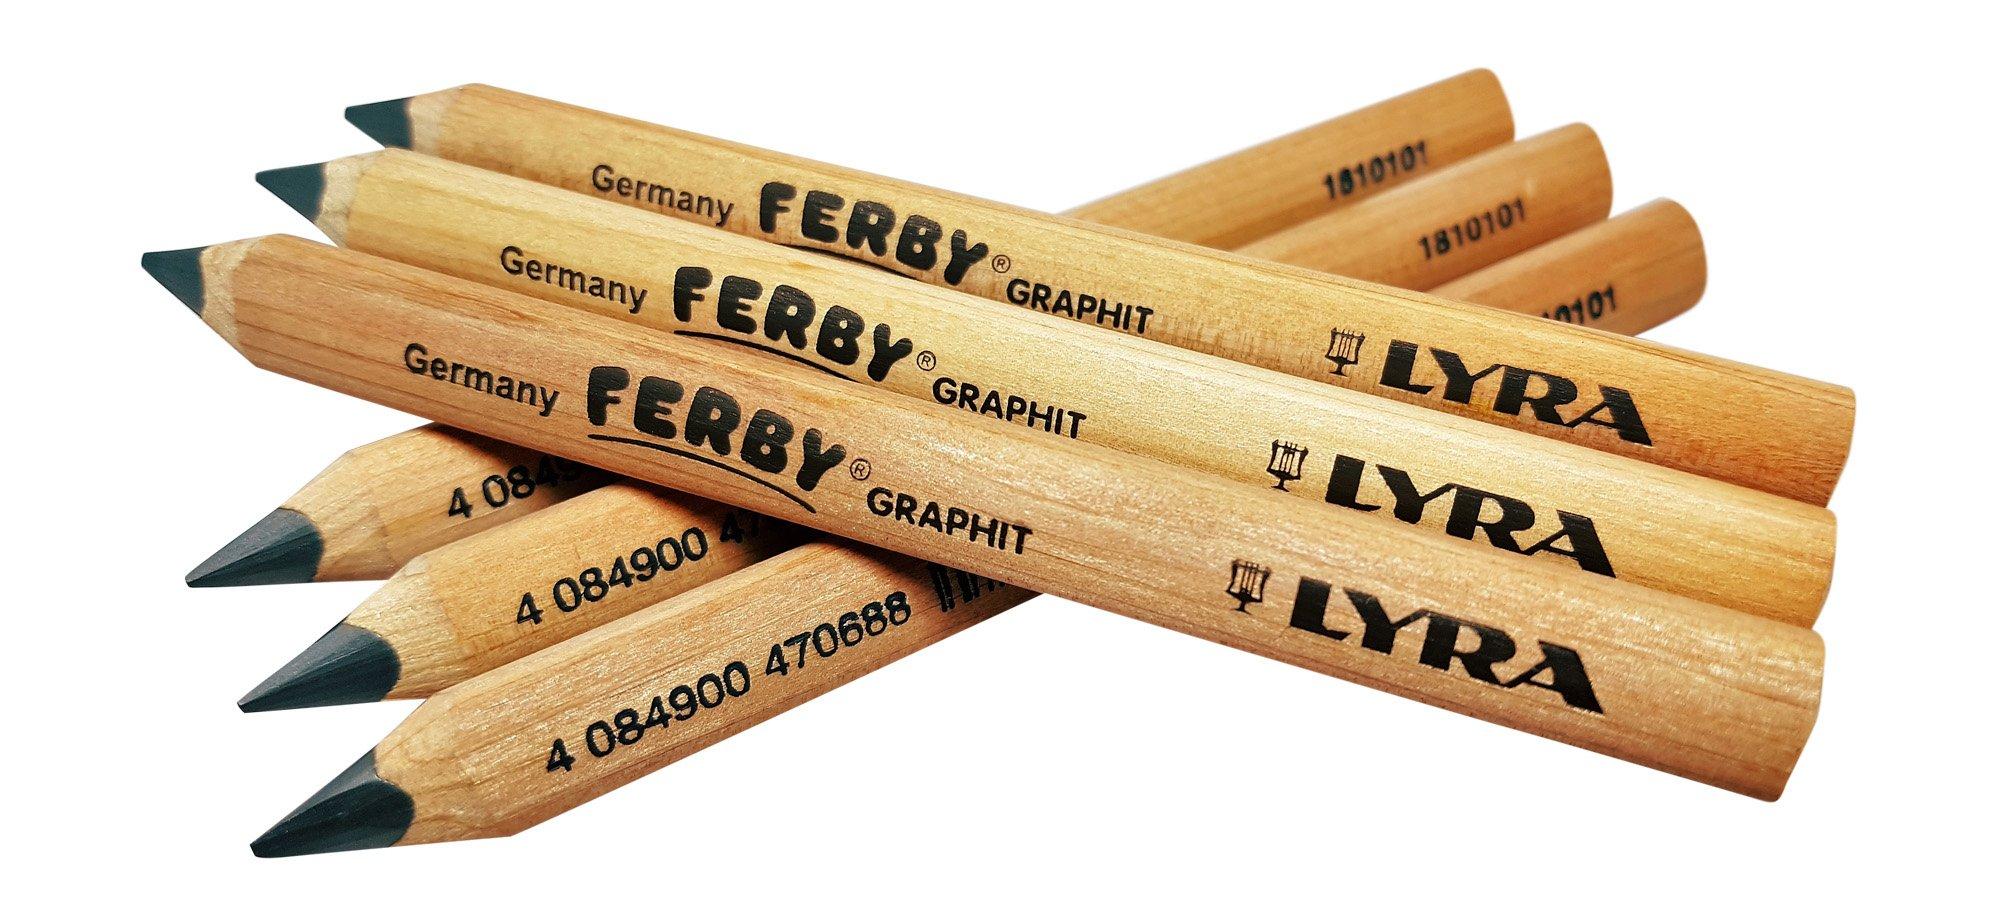 Lyra Ferby Short Tri grip Triangular Children Kindergarten Pencils, School supplies Beginner grip writing pencil for kids, Triangle Pencils, 6 Pencils by Lyra.inc